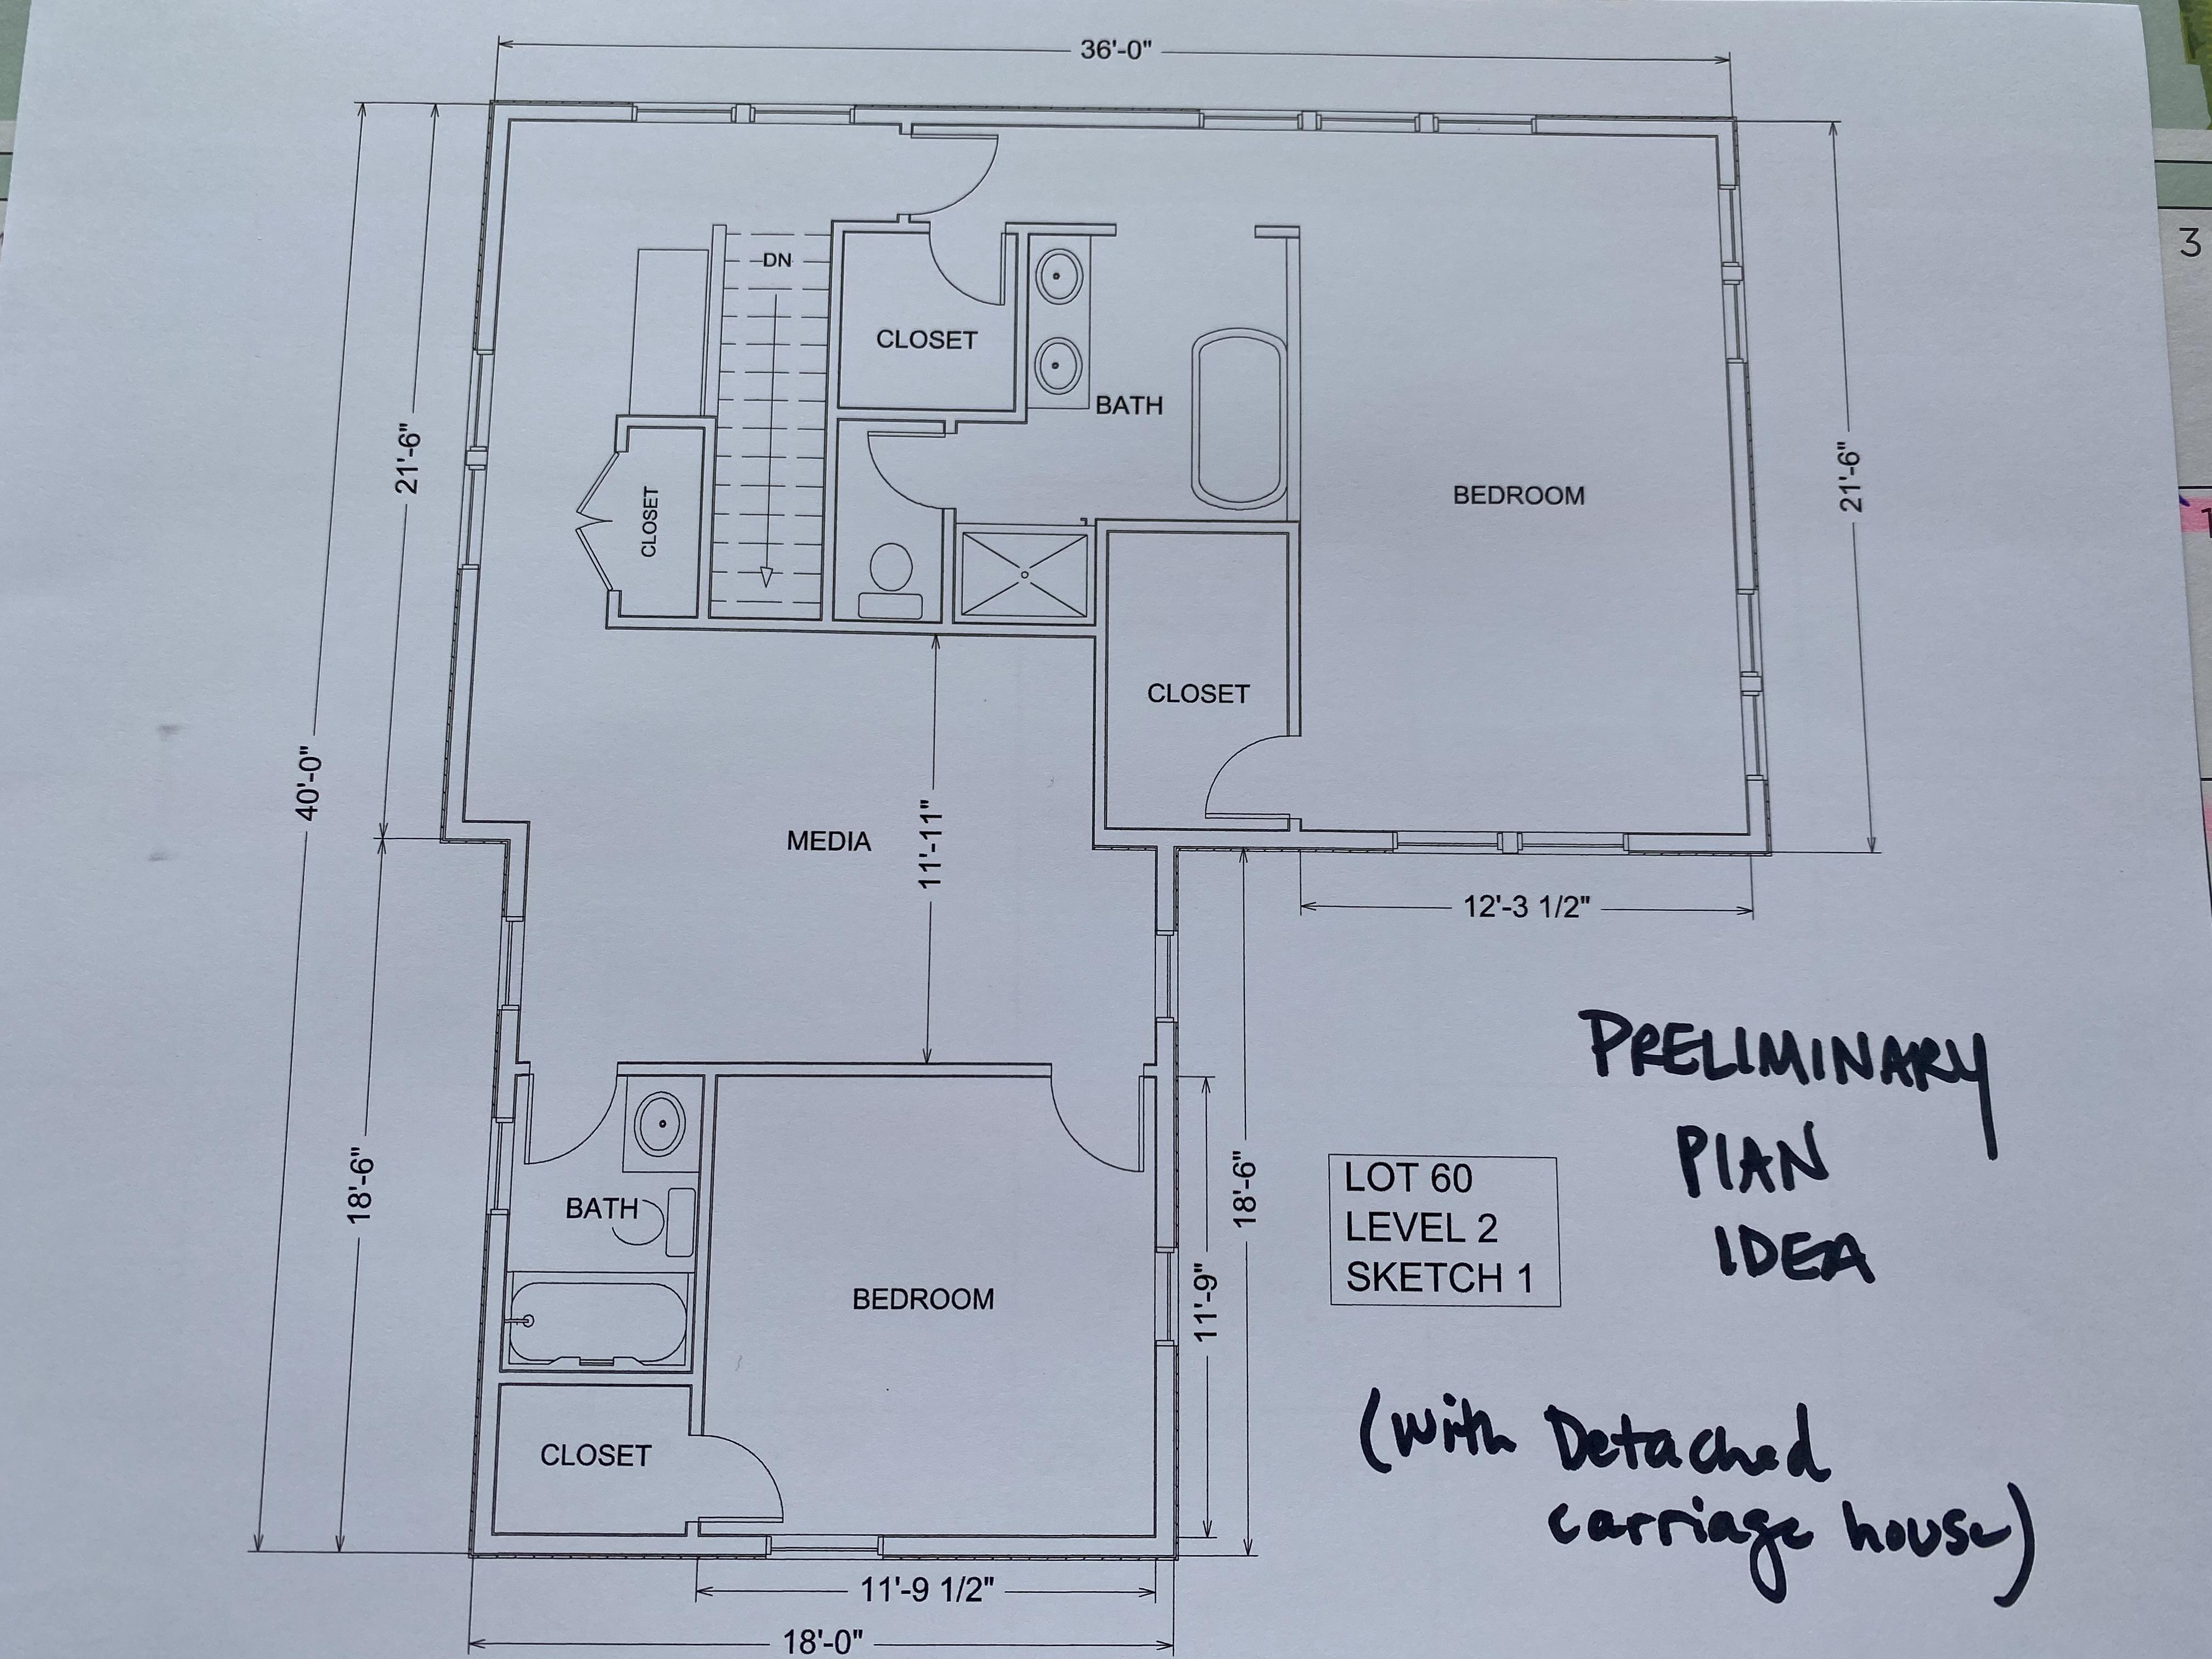 Lot 60 - Level 2 Plan idea